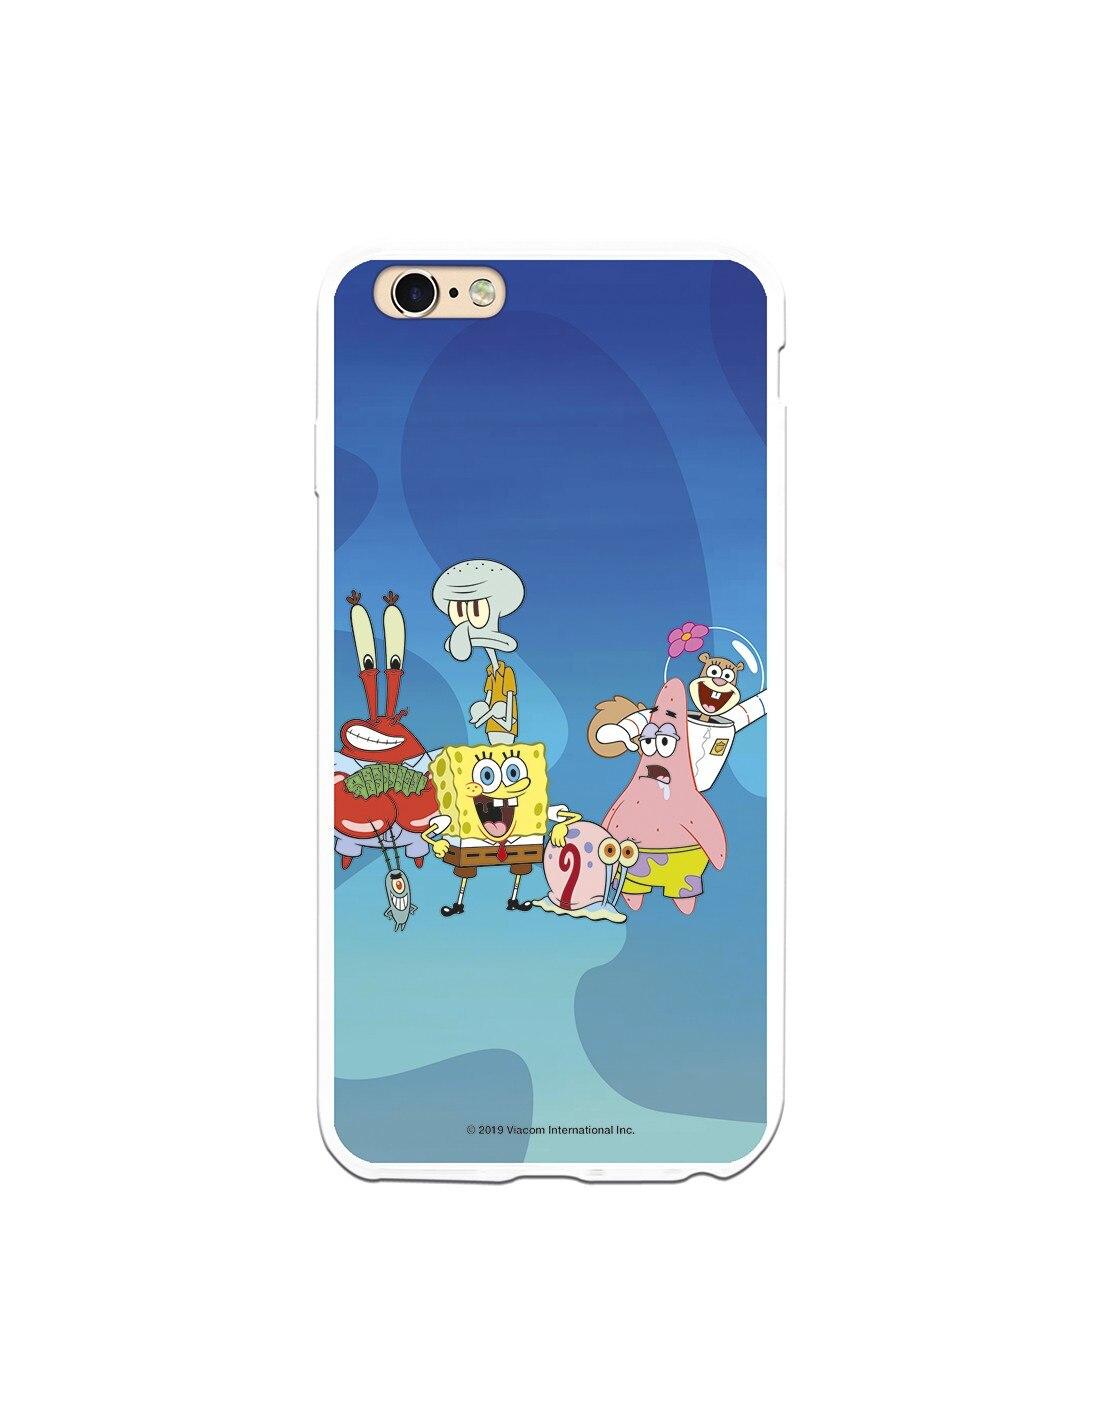 Funda para iPhone 6 Plus Oficial de Nickelodeon Personajes Fondo Marino - Bob Esponja